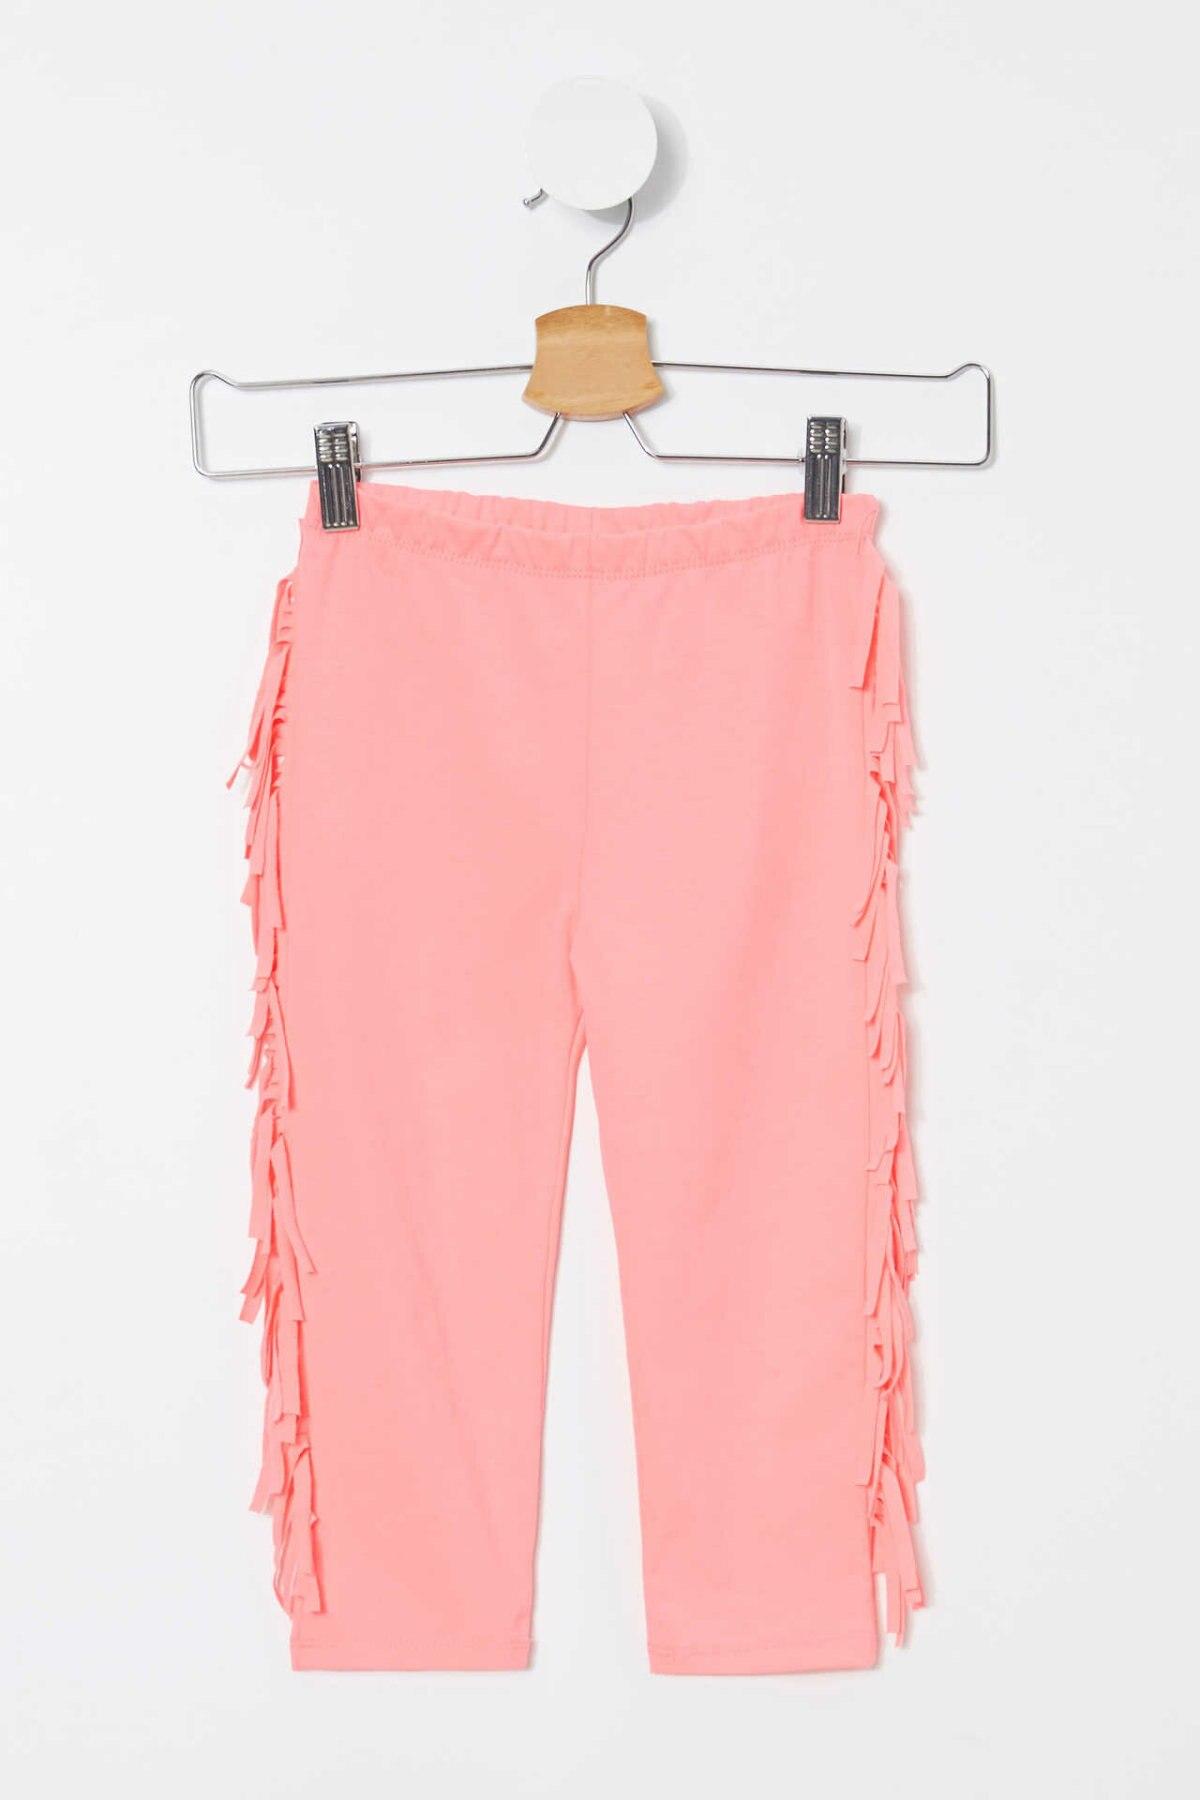 DeFacto Girl Summer Cute Pink Color Tassel Pants Leggings Girls Casual Elastic Bottoms Girls Pants-J3488A619SM